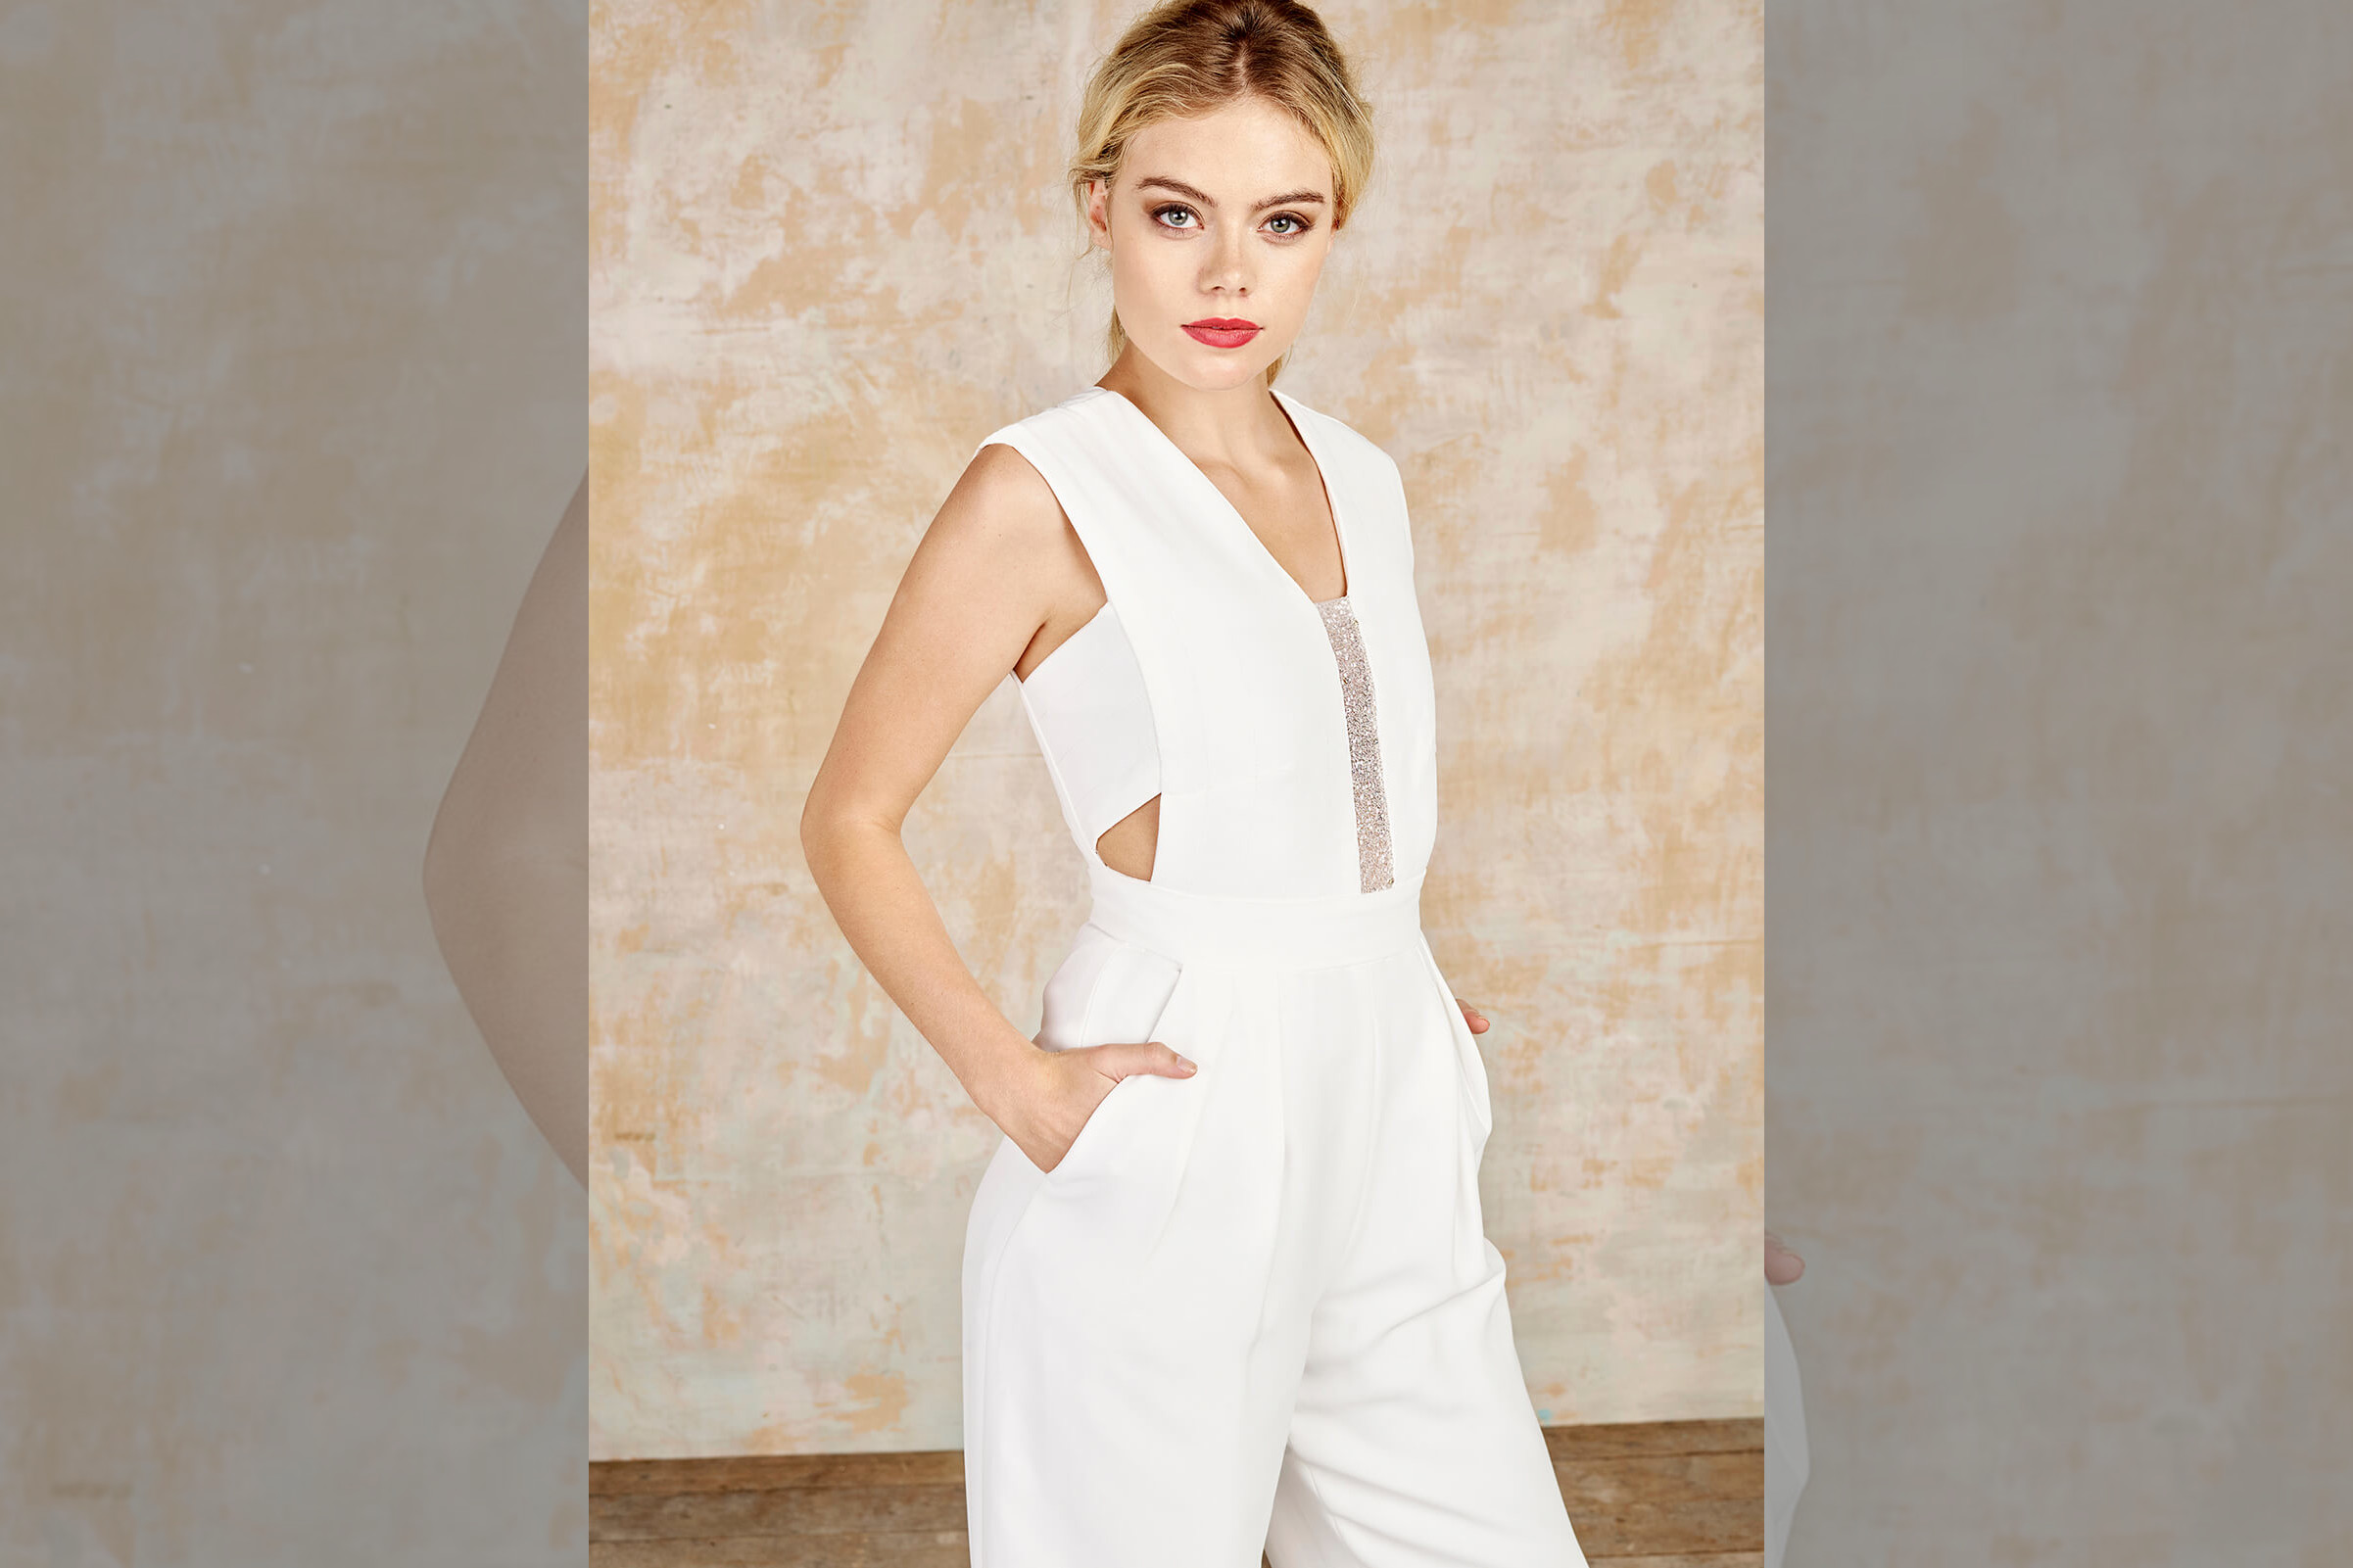 bridebook.co.uk-house-of-ollichon white jumpsuit on model